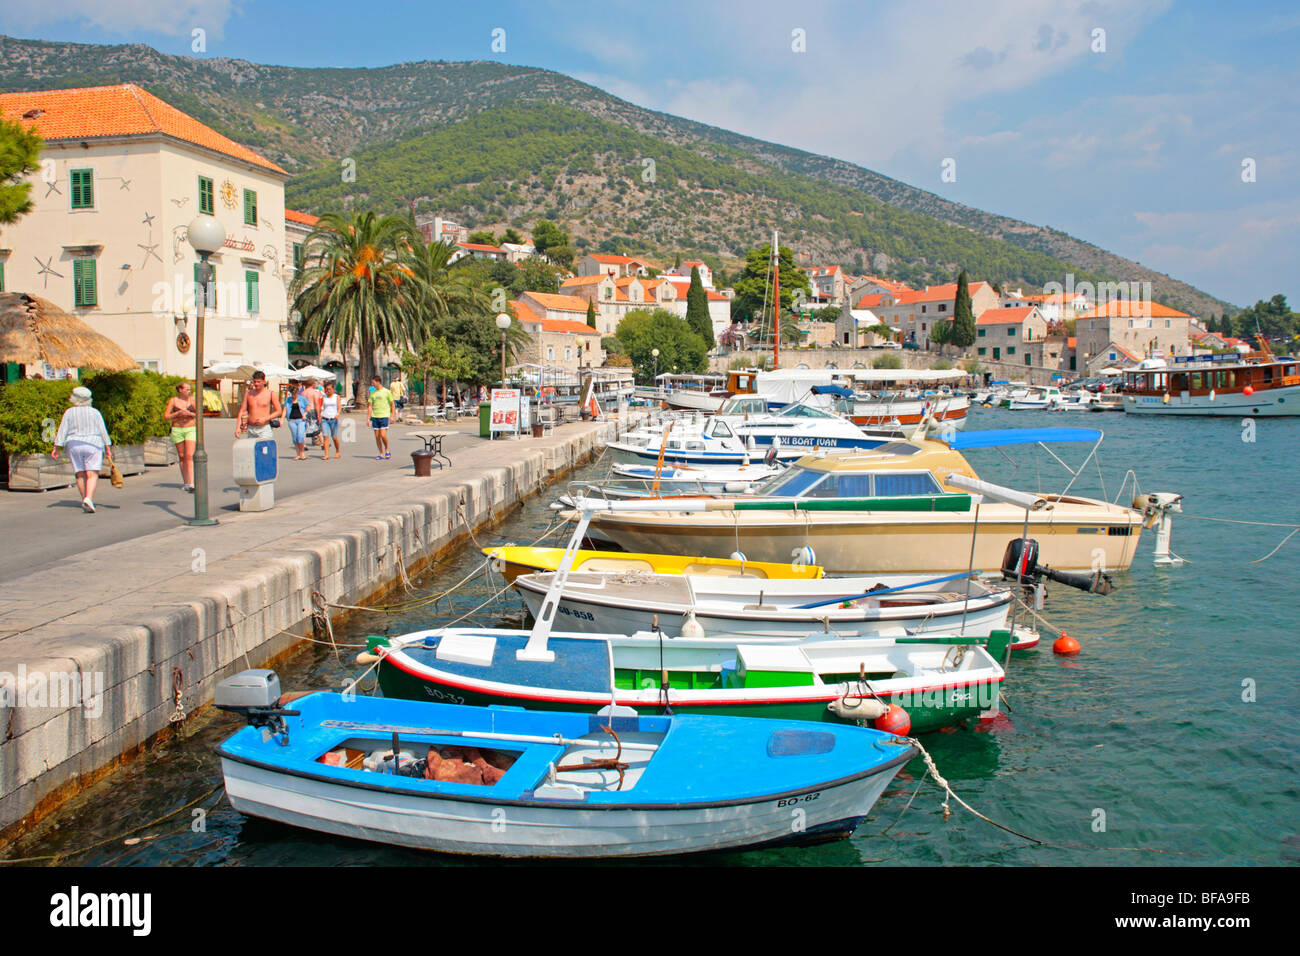 Port de Supetar, île de Brac, Croatie, Dalmatie Centrale Photo Stock